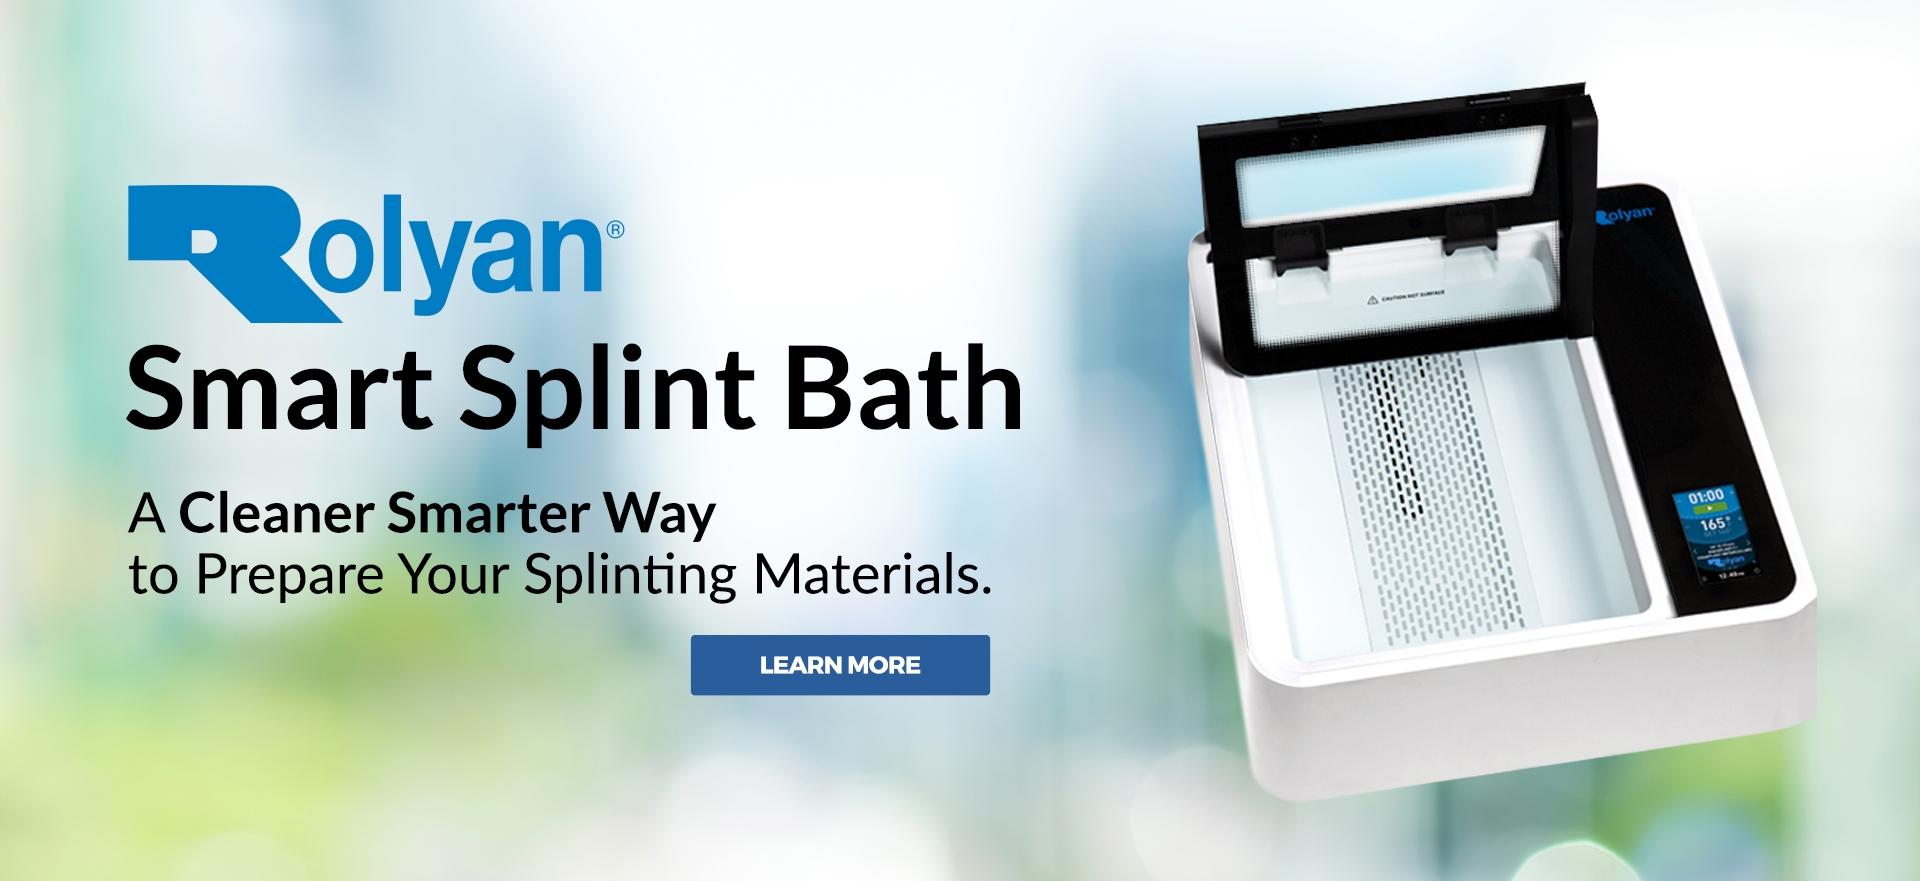 Rolyan Splint Bath